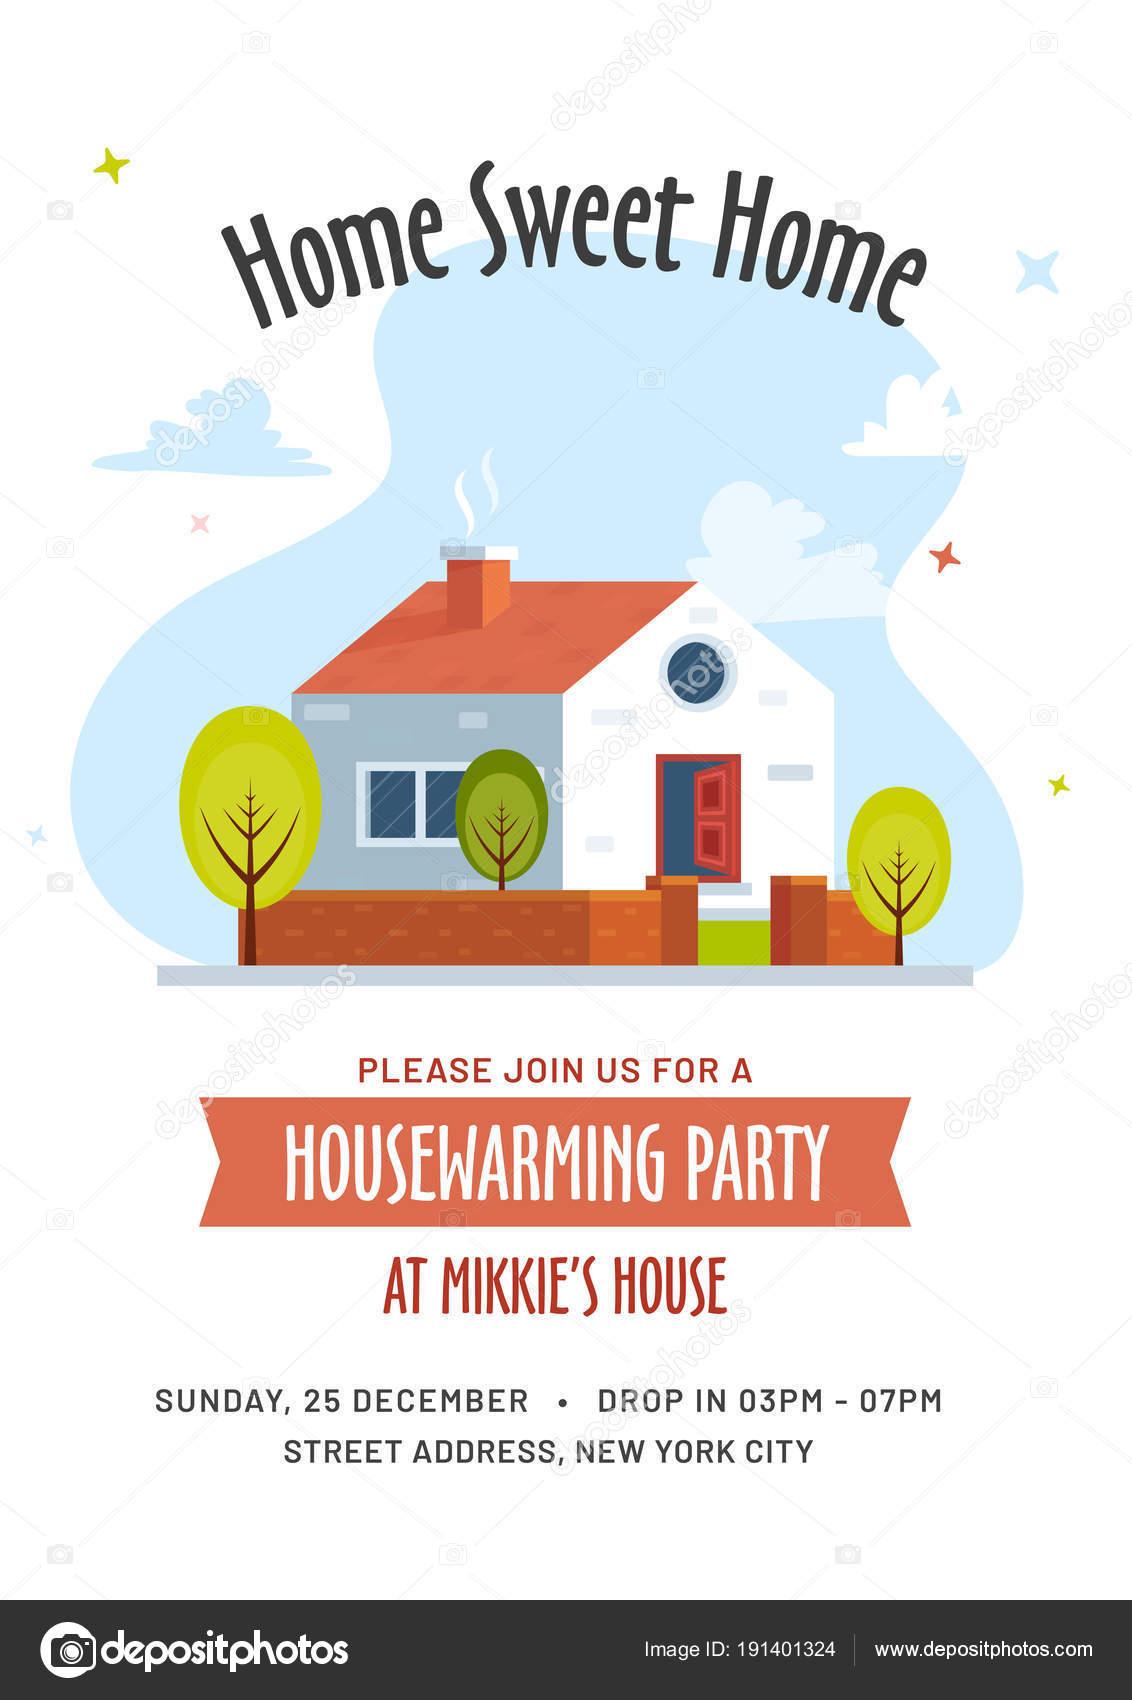 Housewarming Party Invitation Card Design Stock Vector